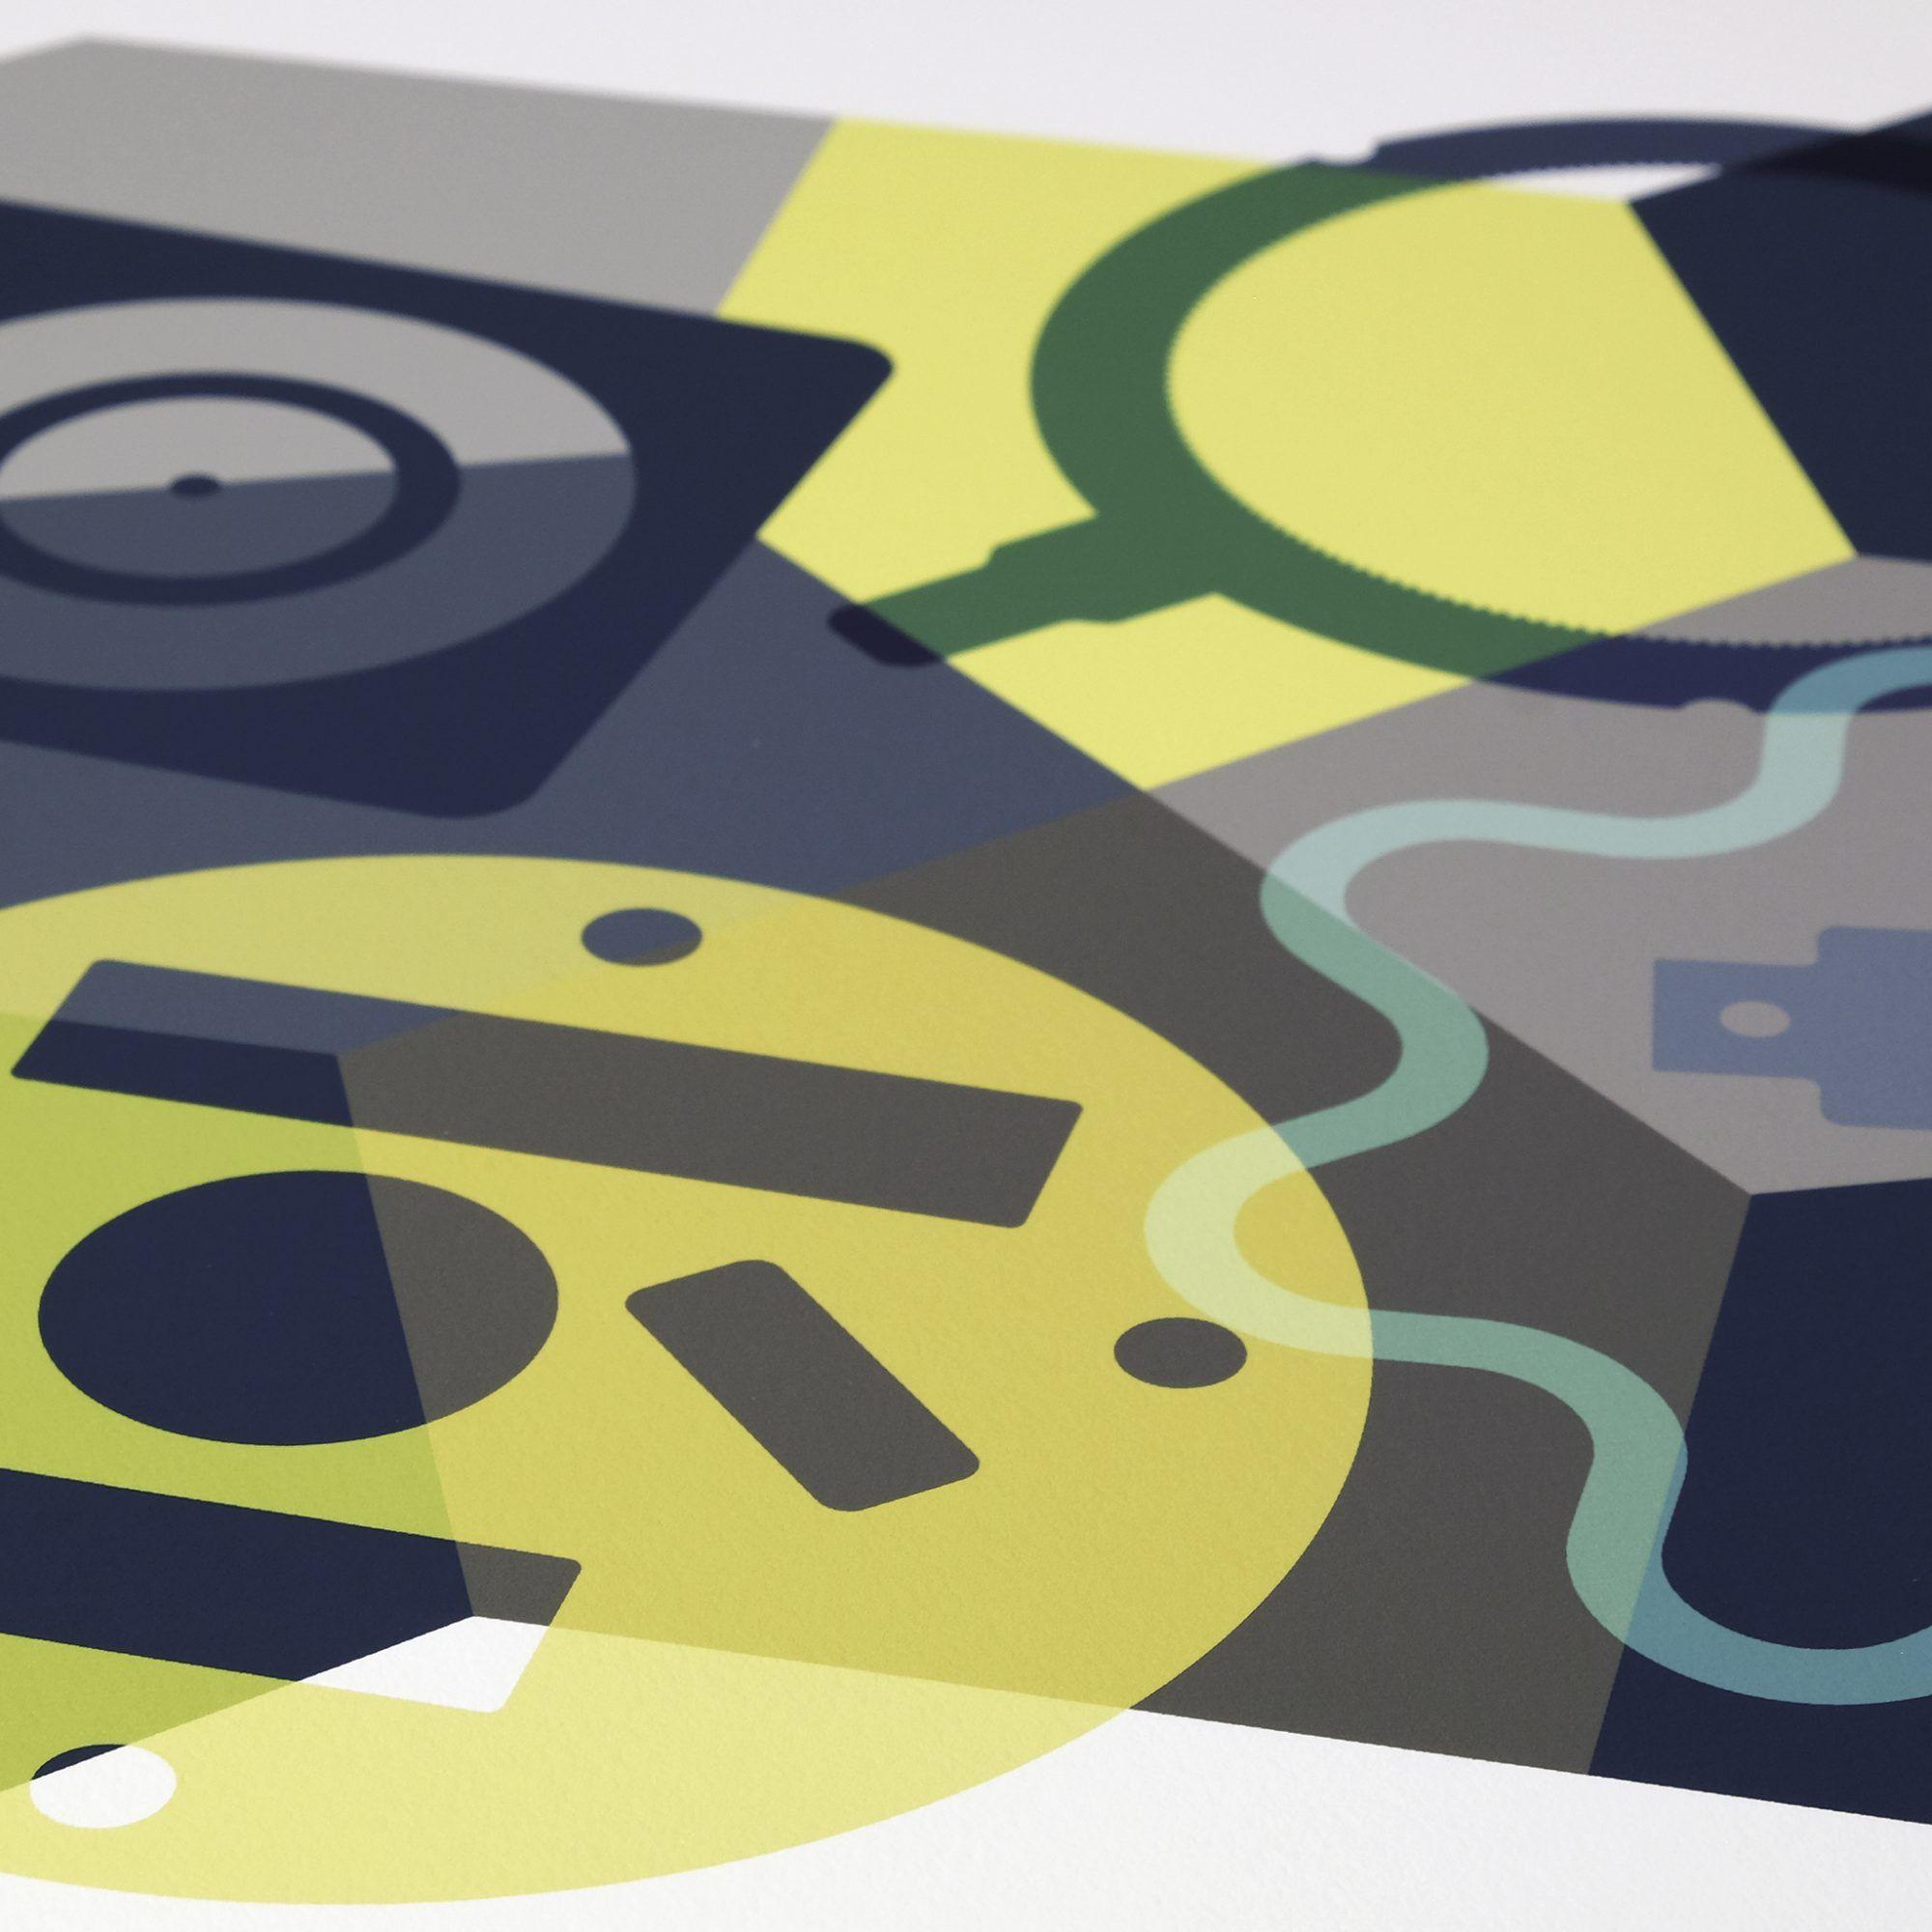 SKALA Nº4 geometric abstract print by imagesurgery